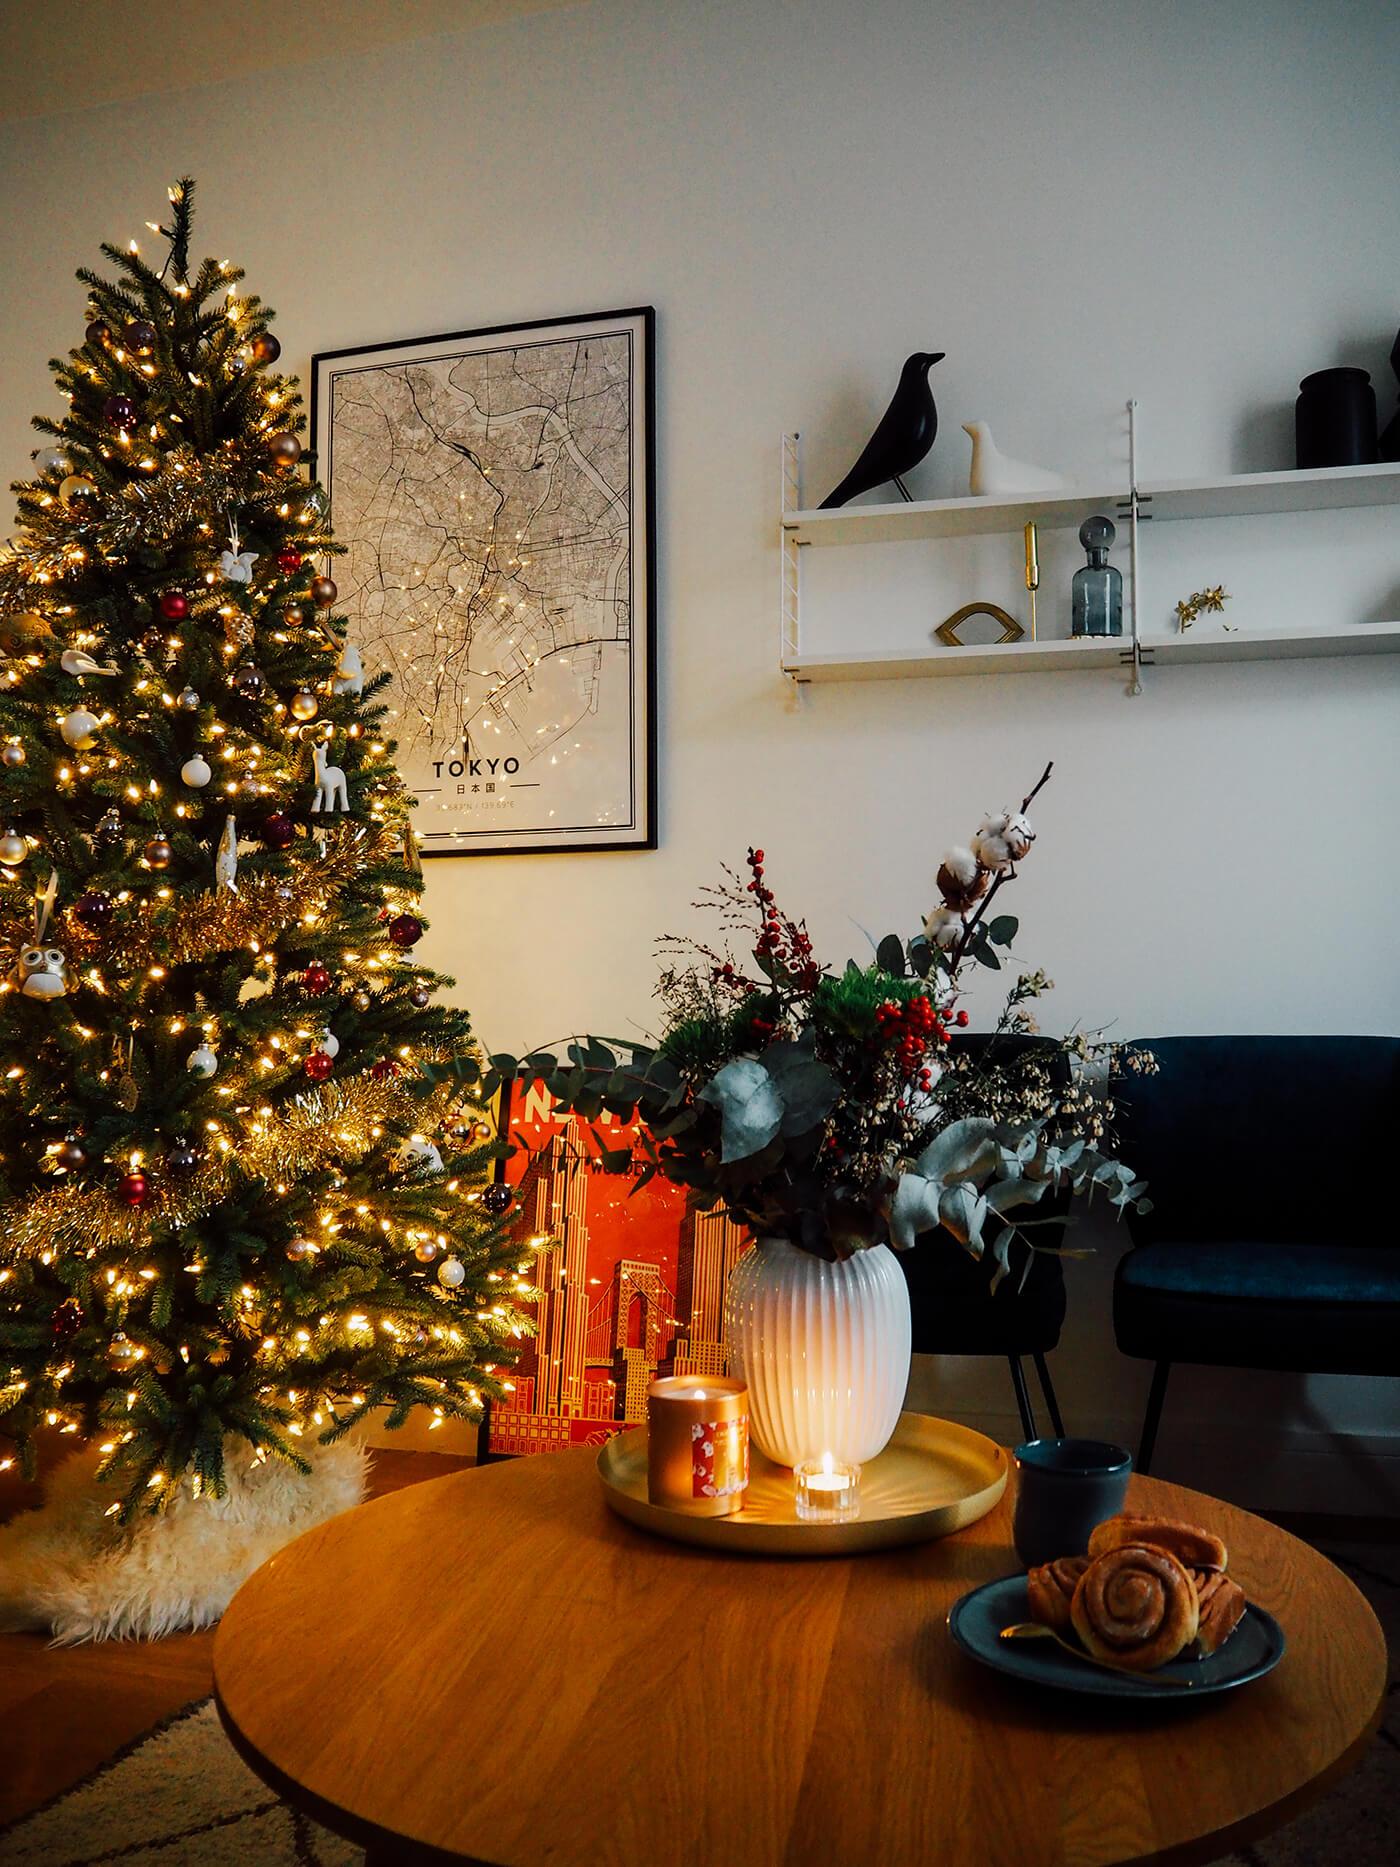 decorer appartement noel sapin artificiel balsam hill frenchyfancy 11 frenchy fancy. Black Bedroom Furniture Sets. Home Design Ideas